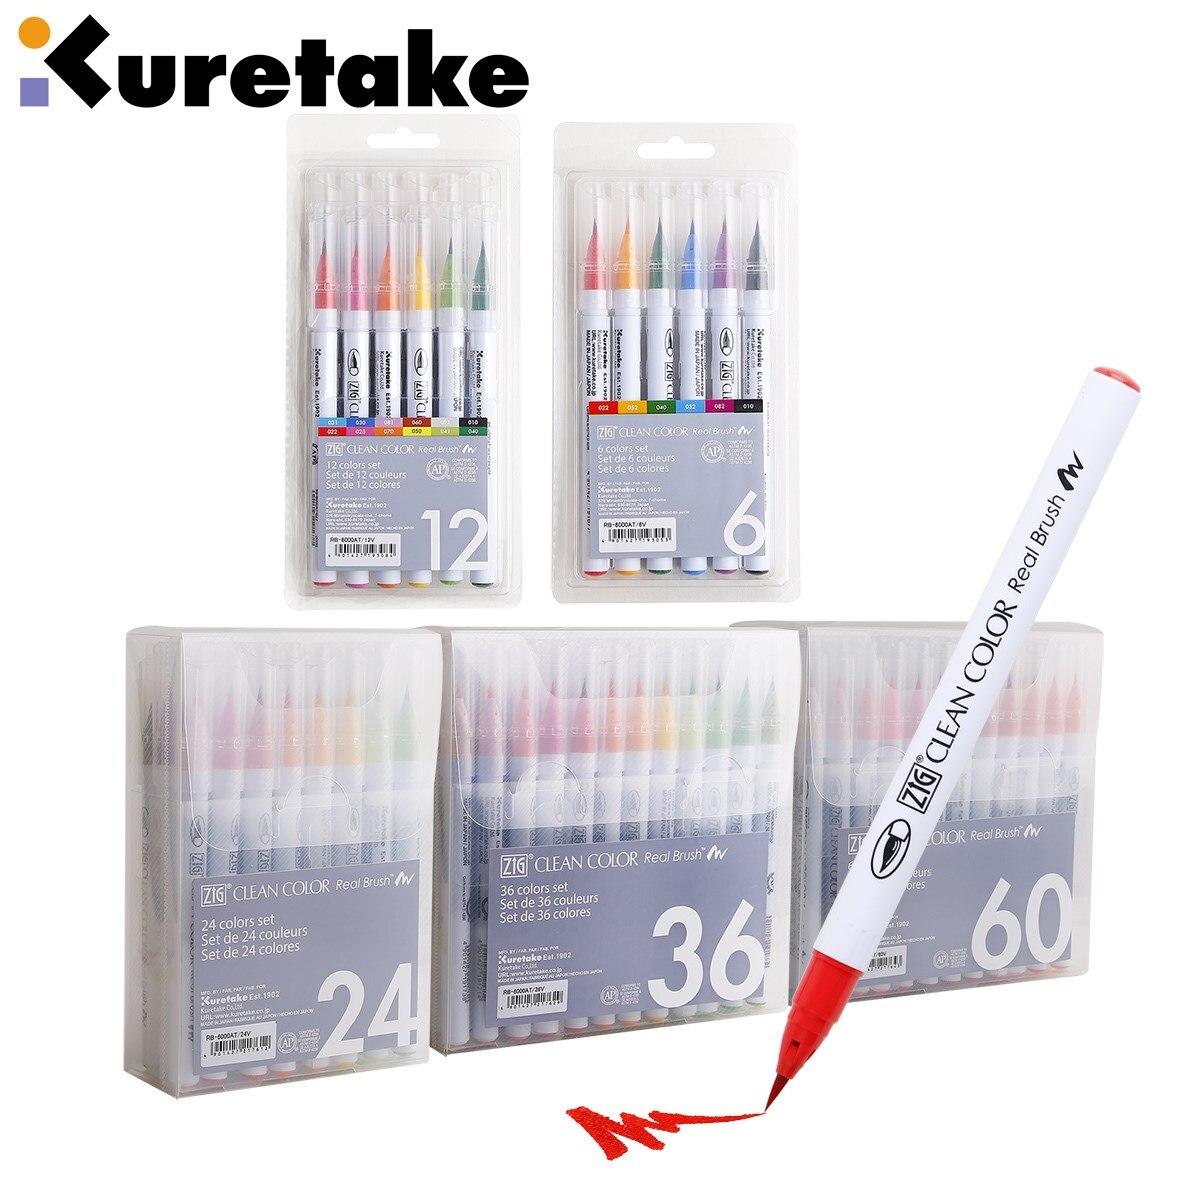 1set Japan Zig Kuretake RB-6000AT Sauber Farbe Echt Pinsel Aquarell Stifte 4/6/12/24/36/48/60/90 Farben Set Pinsel Schriftzug